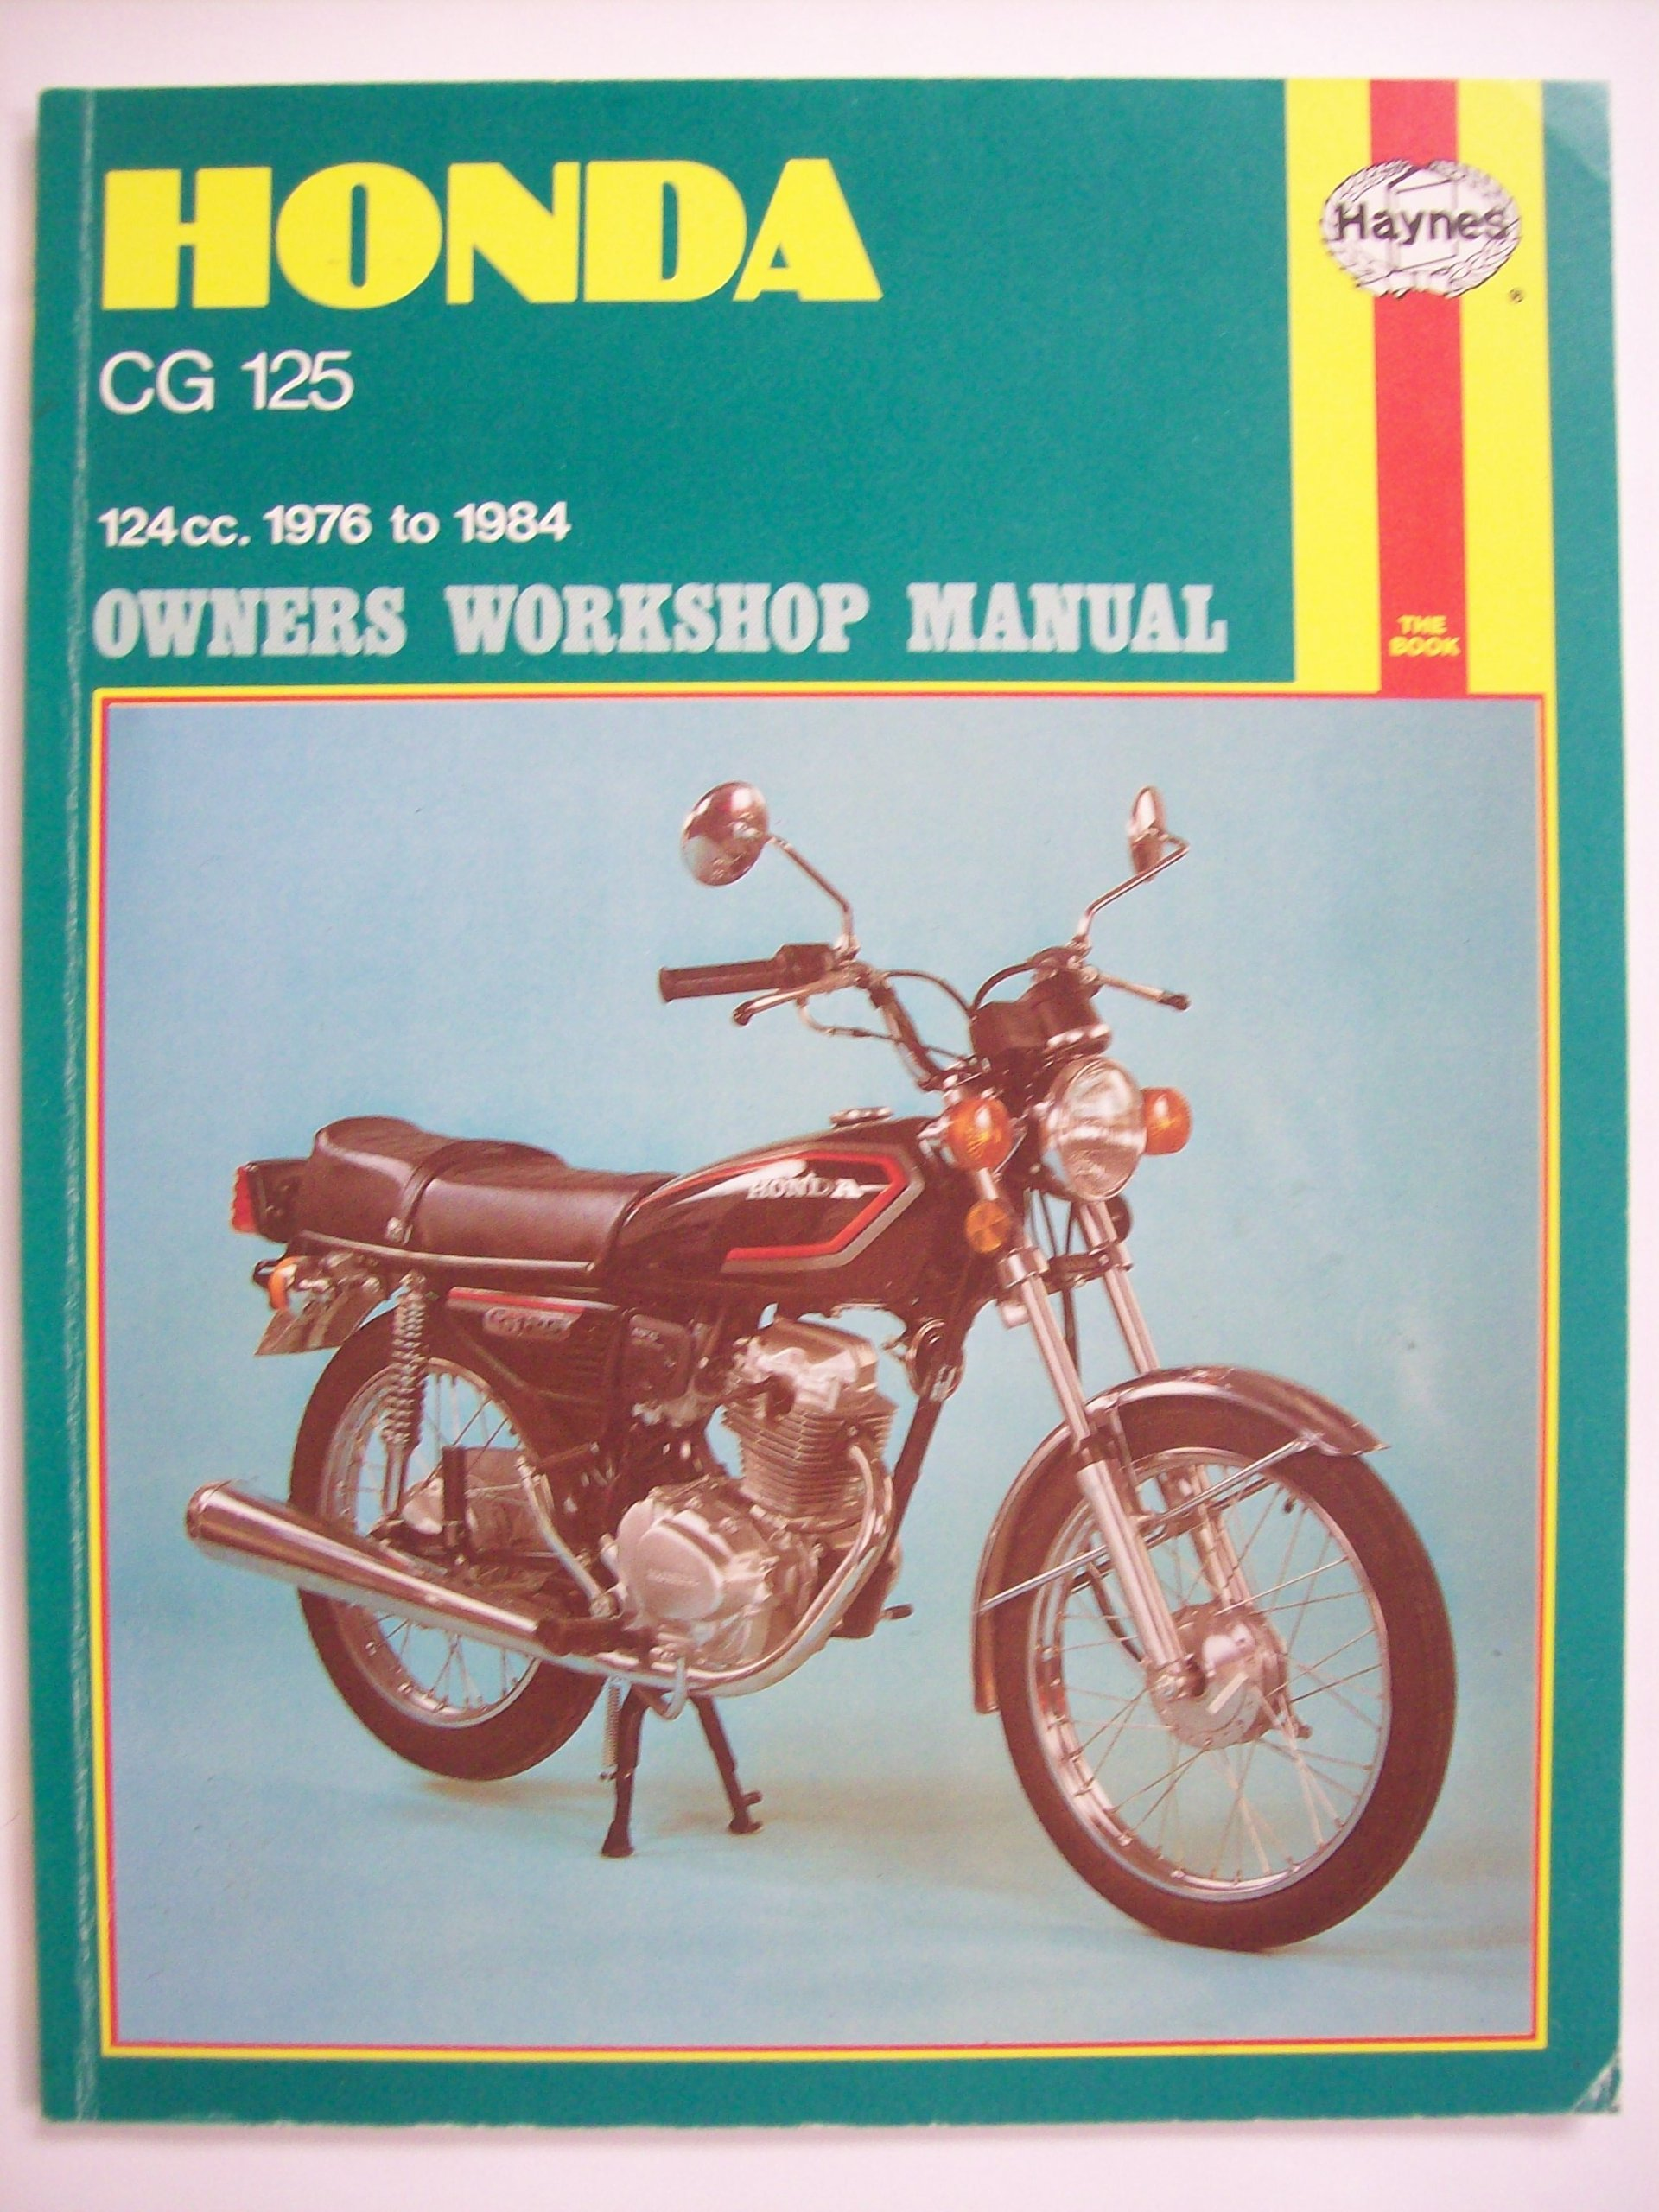 2015 honda cg 125 workshop manual array honda cg125 1976 84 owner u0027s workshop manual amazon co uk pete rh amazon fandeluxe Images